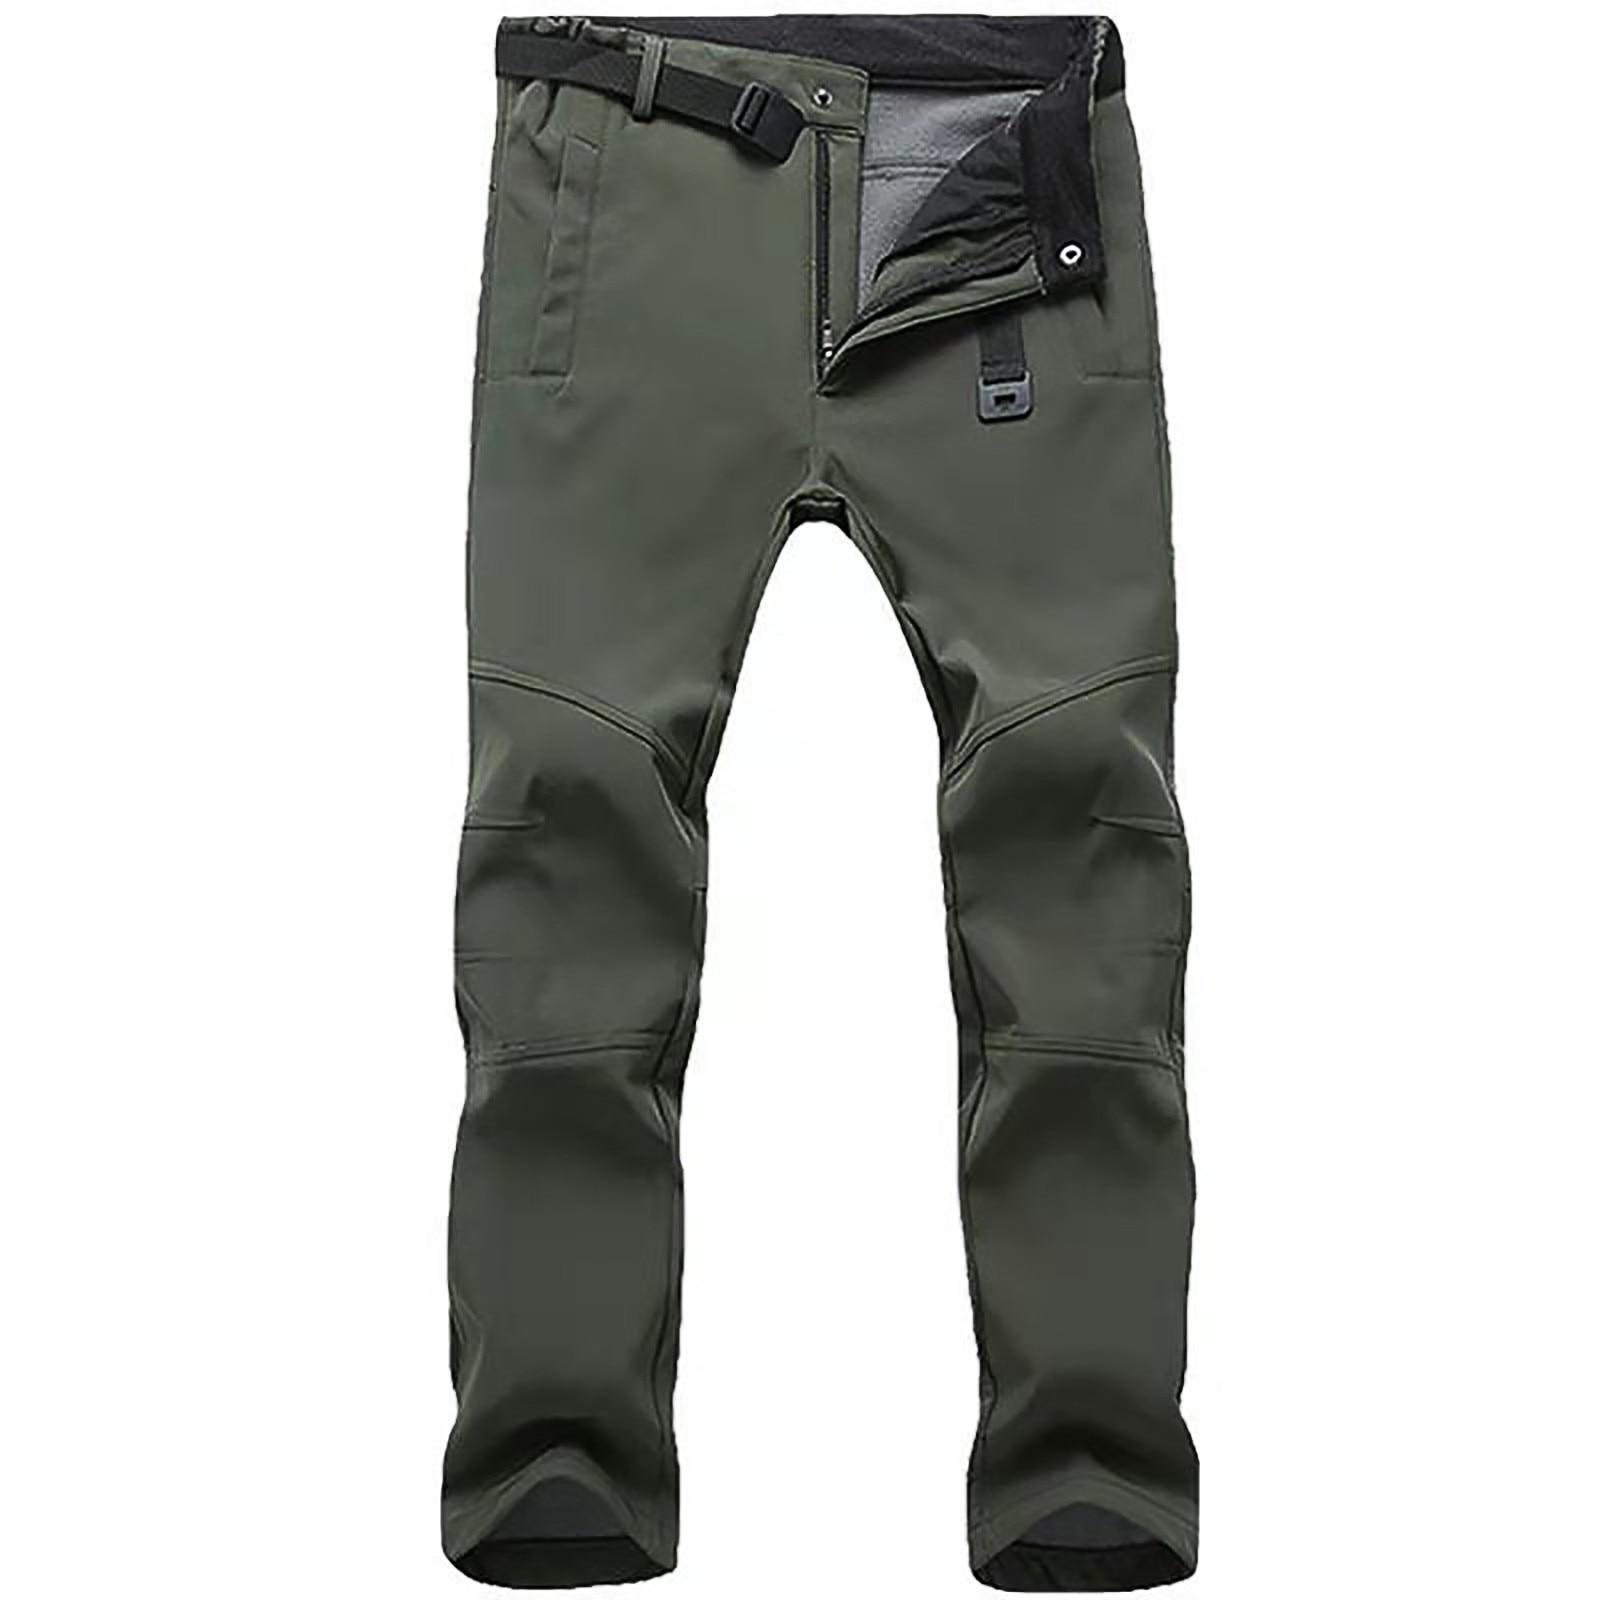 Men Outdoor softshell tactical pant Male winter waterproof Army Combat Military Camp Fish Ski Trek Hike Climb Sport Warm Trouser